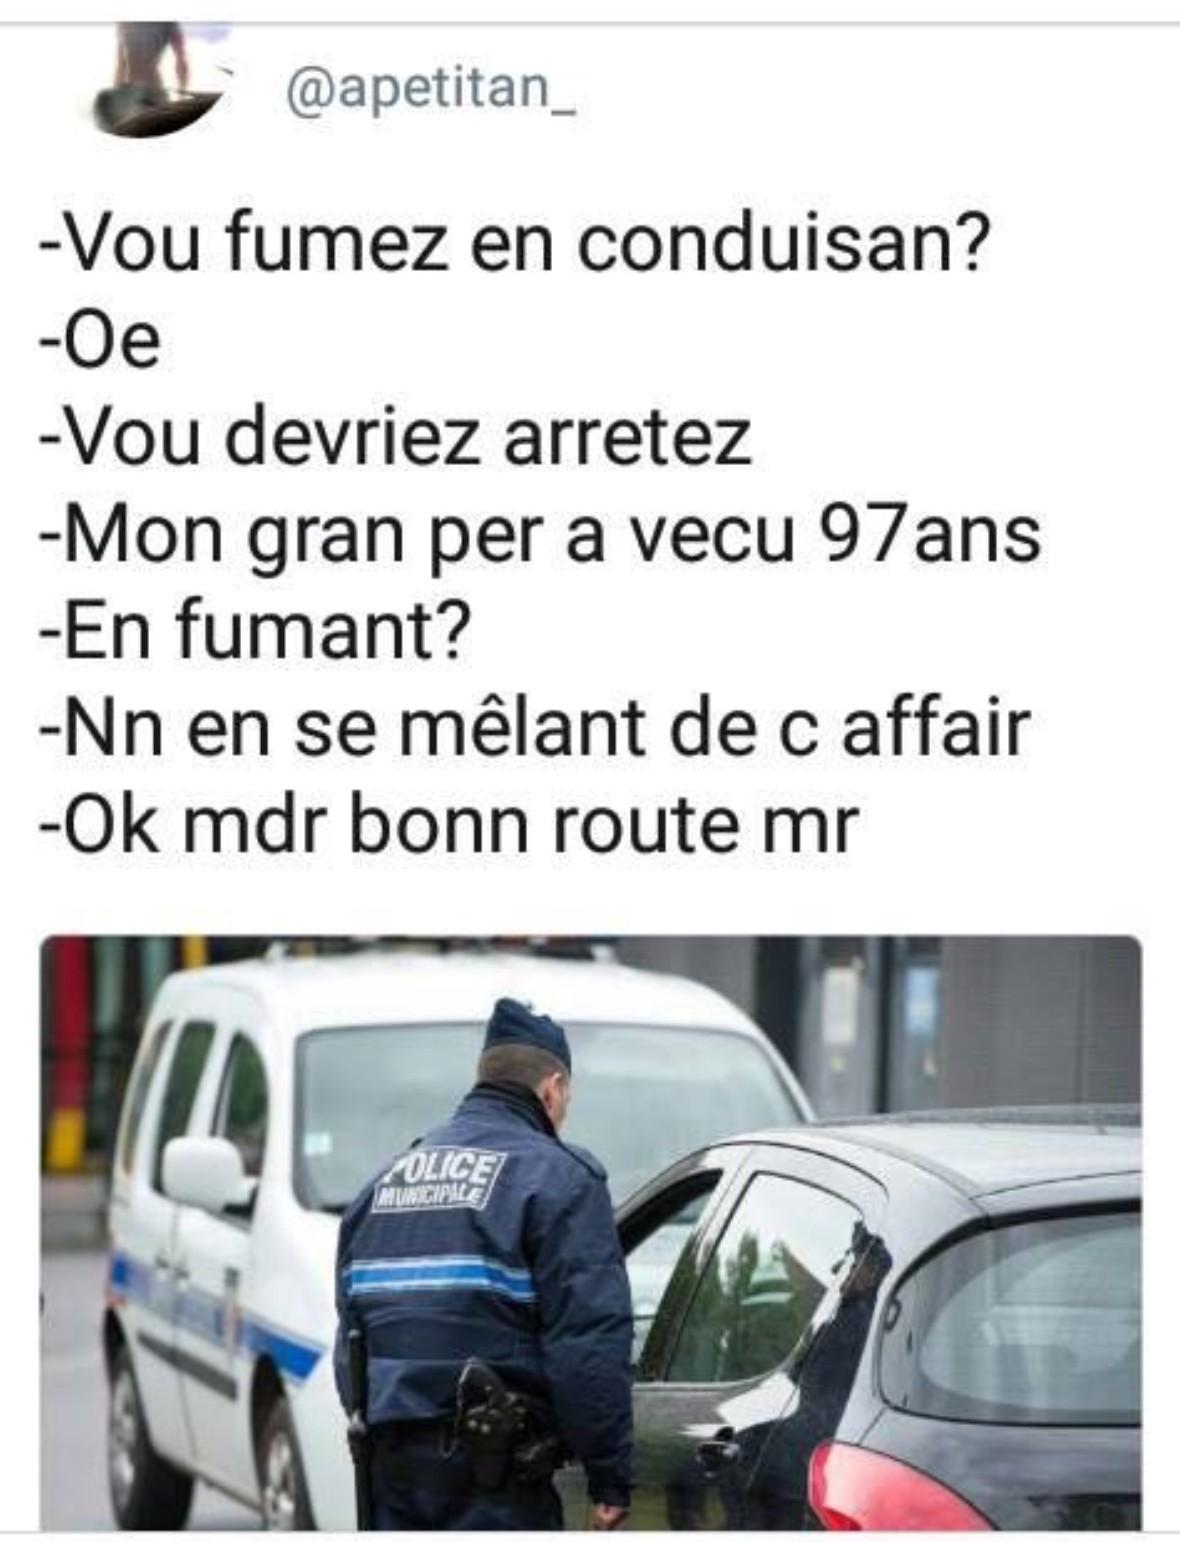 Bang bang la police - meme